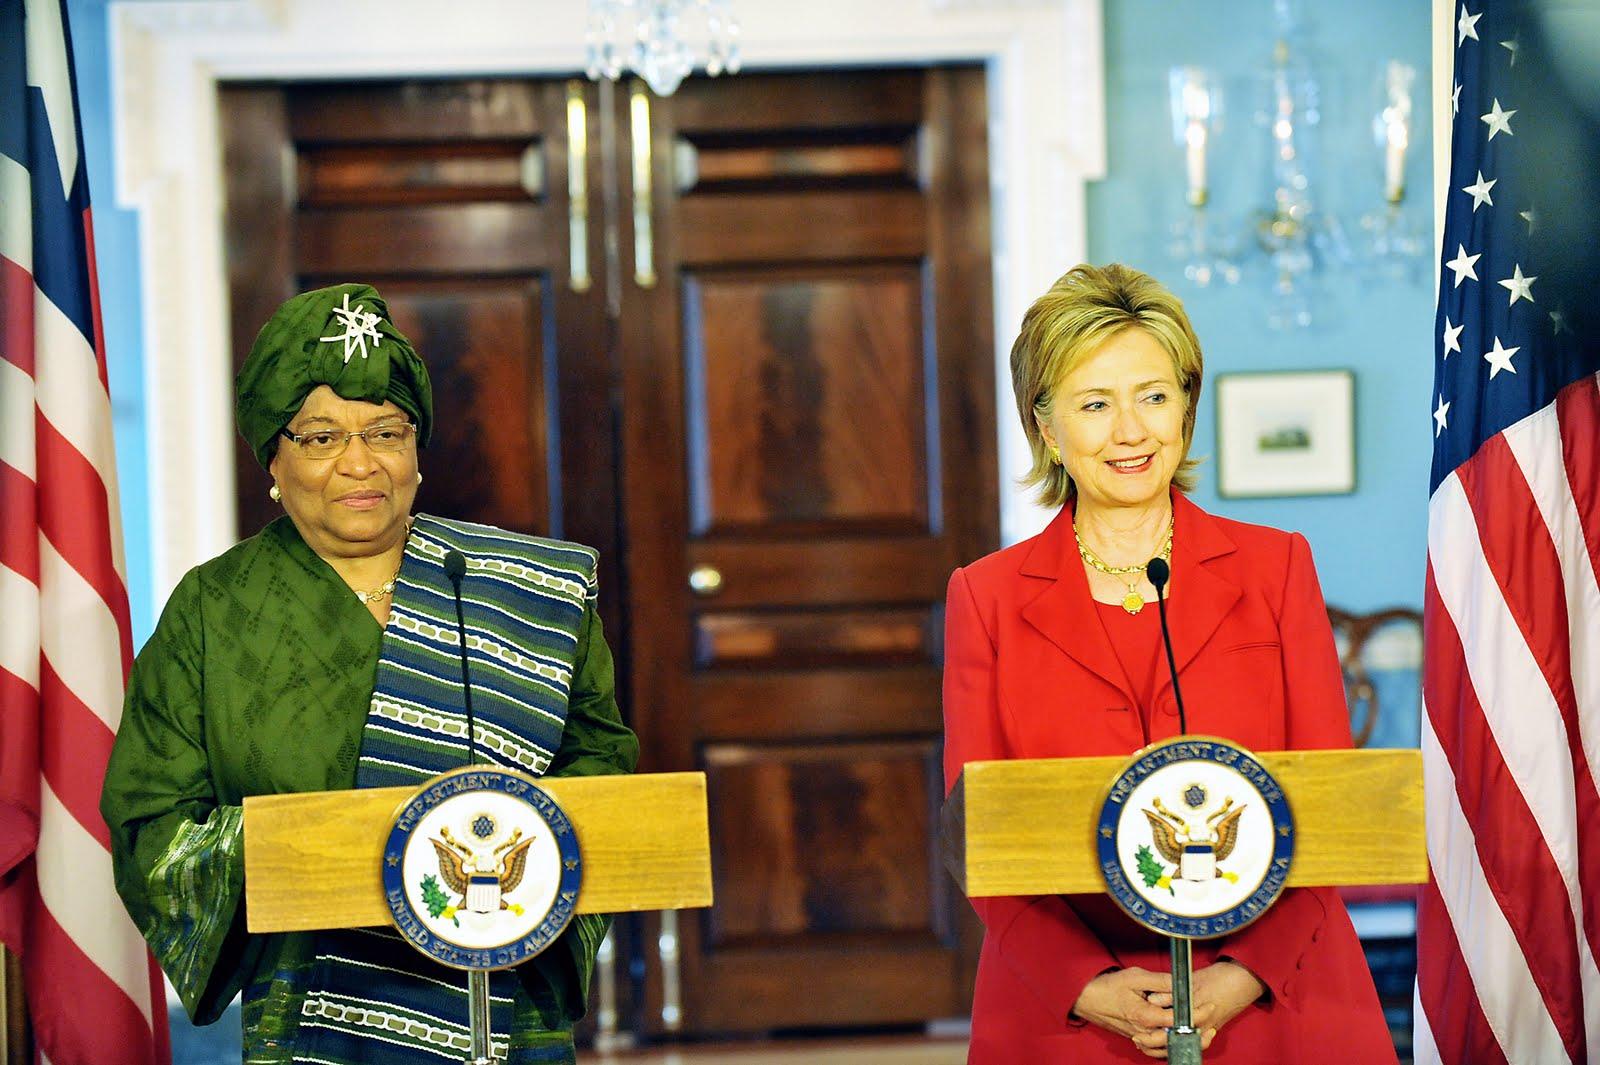 http://4.bp.blogspot.com/-k-fKuWeyKHk/Tn_7tXKRC_I/AAAAAAAAC_0/JOpGBGVFhbg/s1600/Hillary_Clinton_meets_with_Liberian_President_Ellen_Johnson-Sirleaf%252C_April_2009-3.jpg